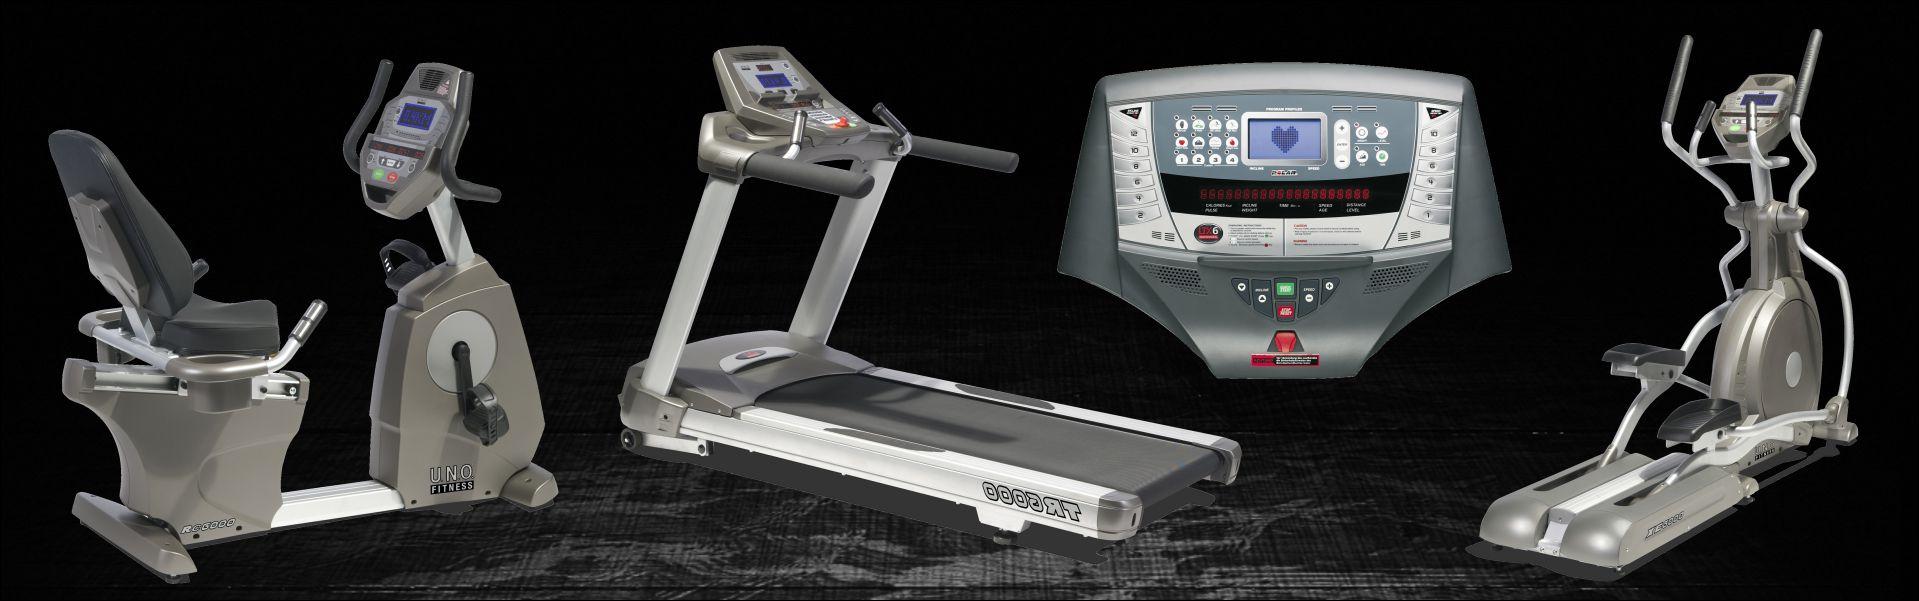 Moderne Cardio Maschinen